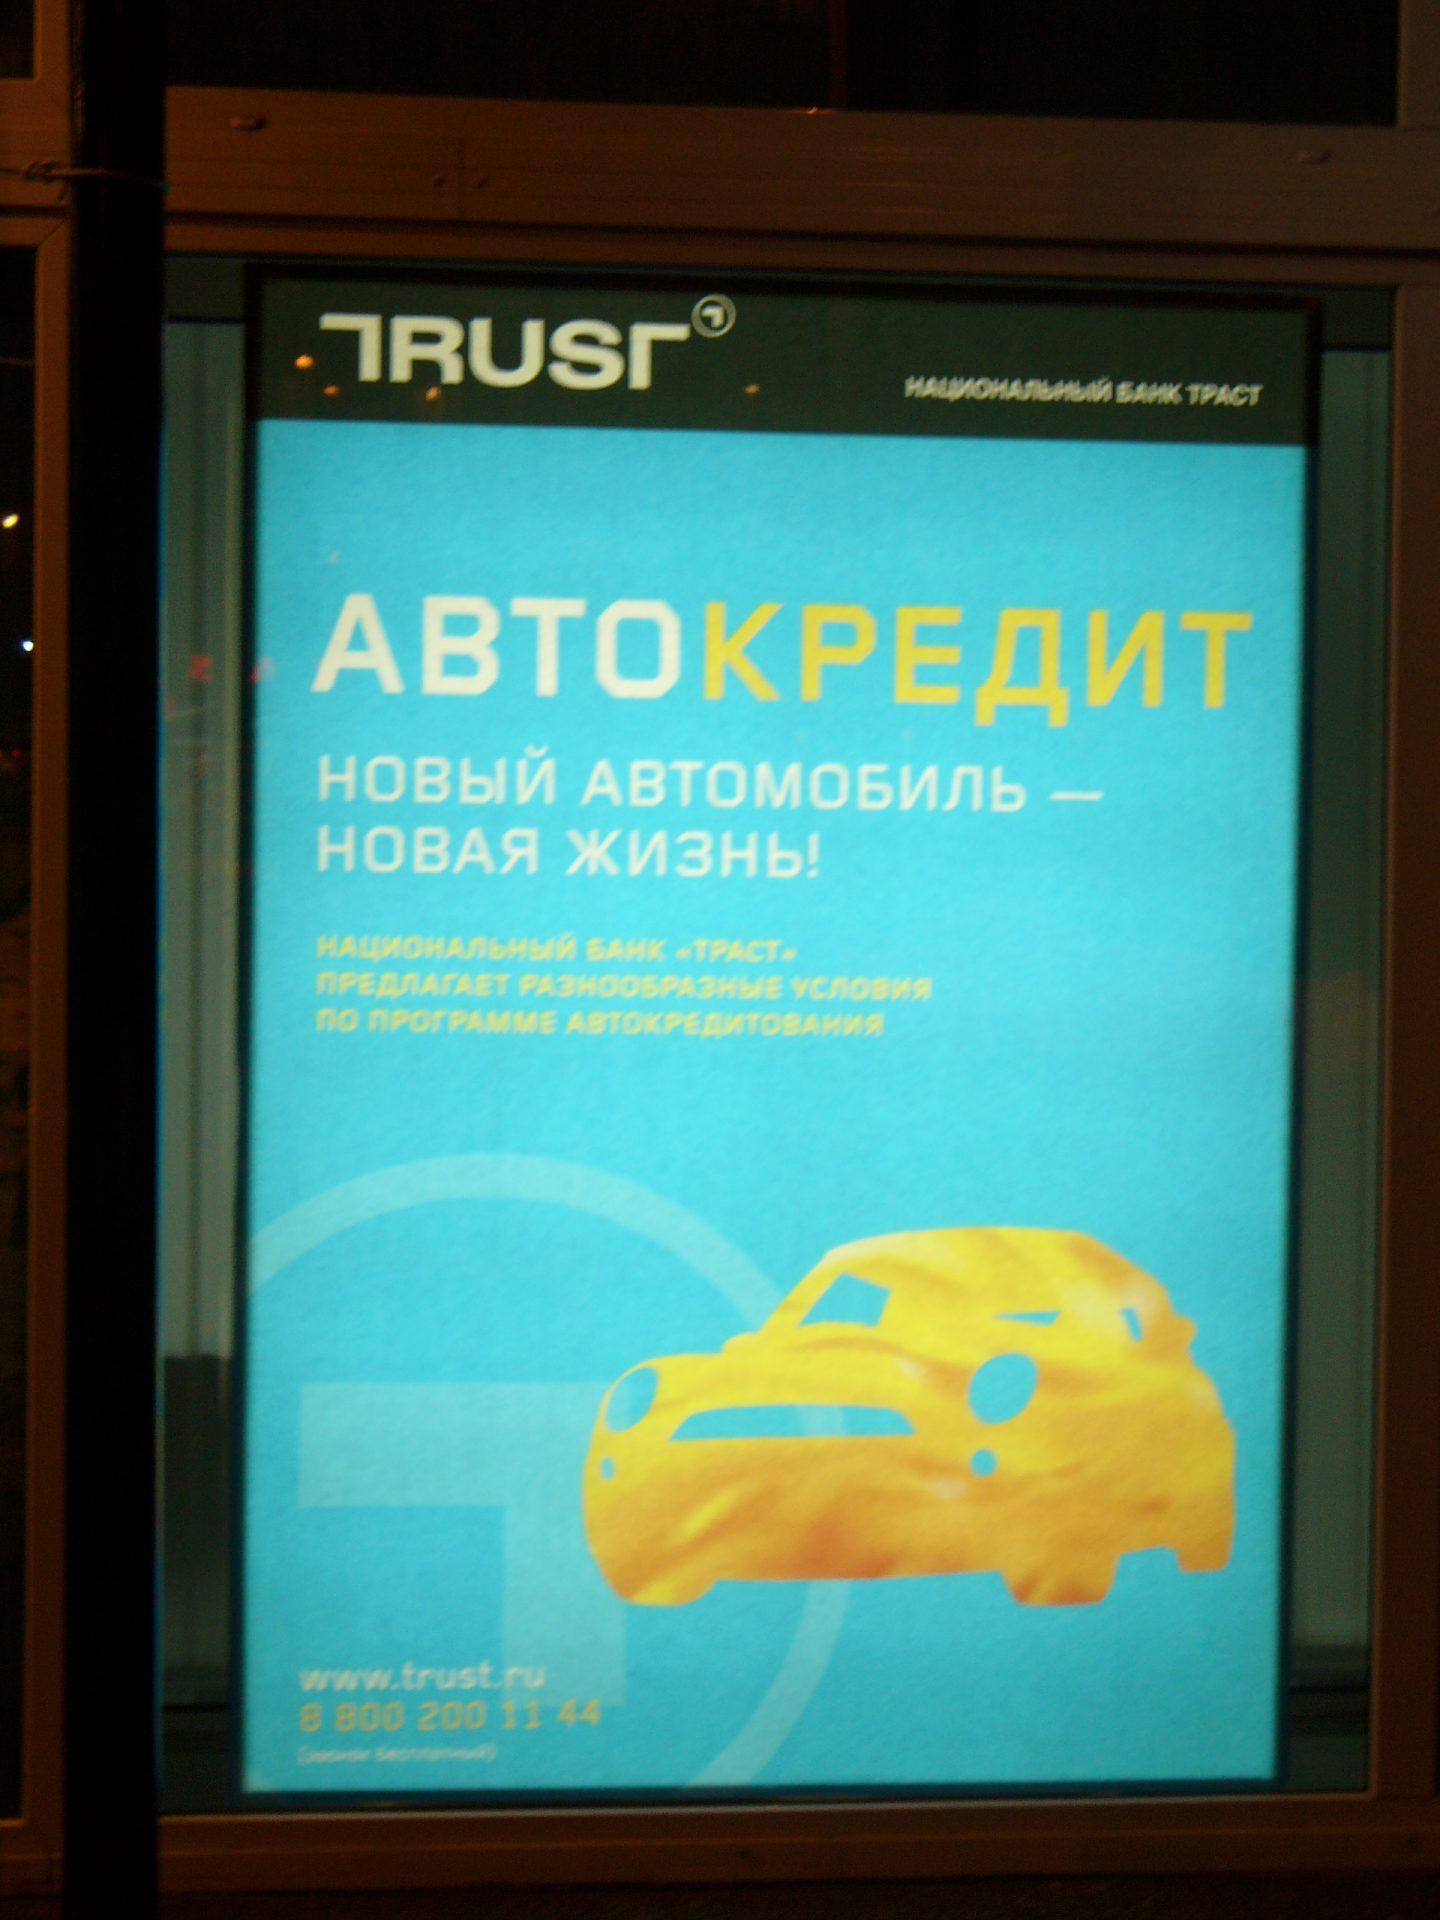 Национальный банк Траст